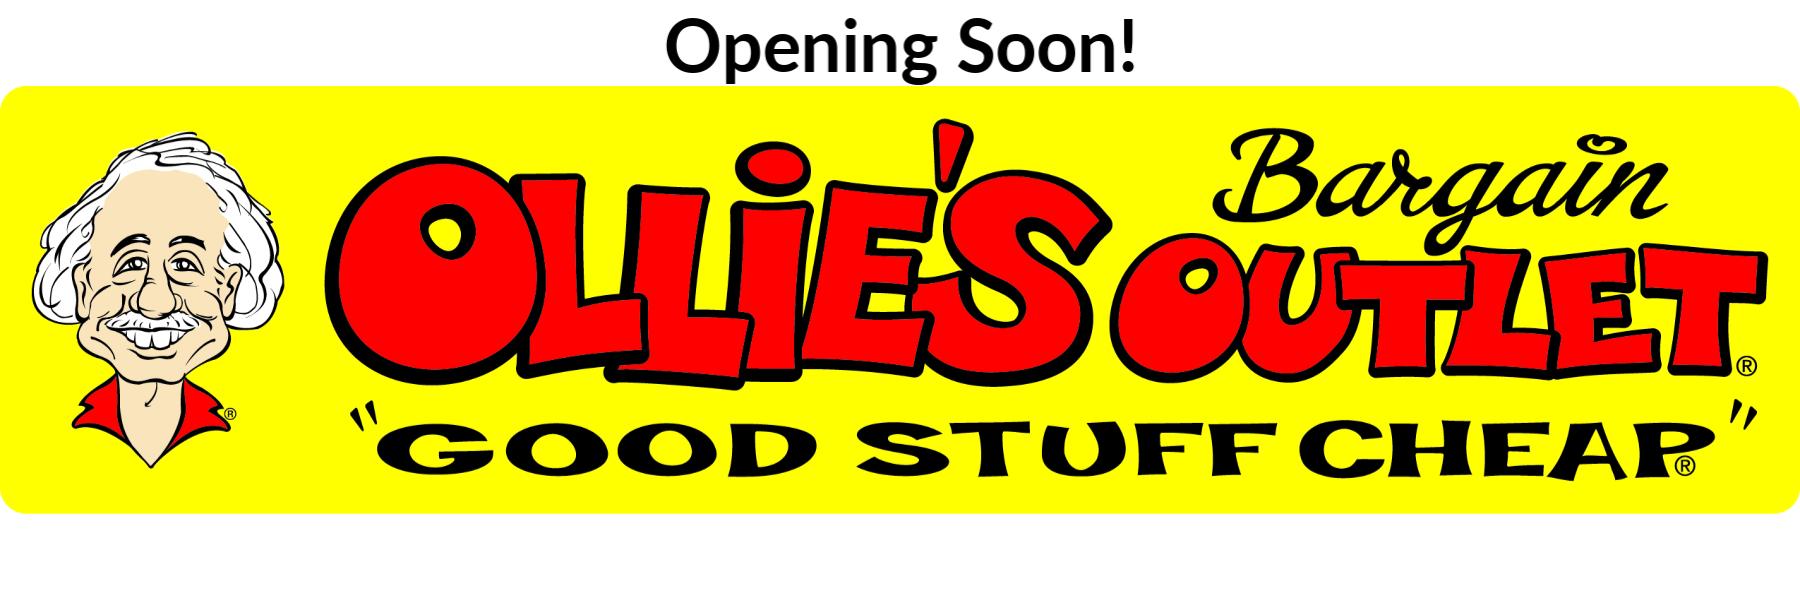 Ollies Opening Soon